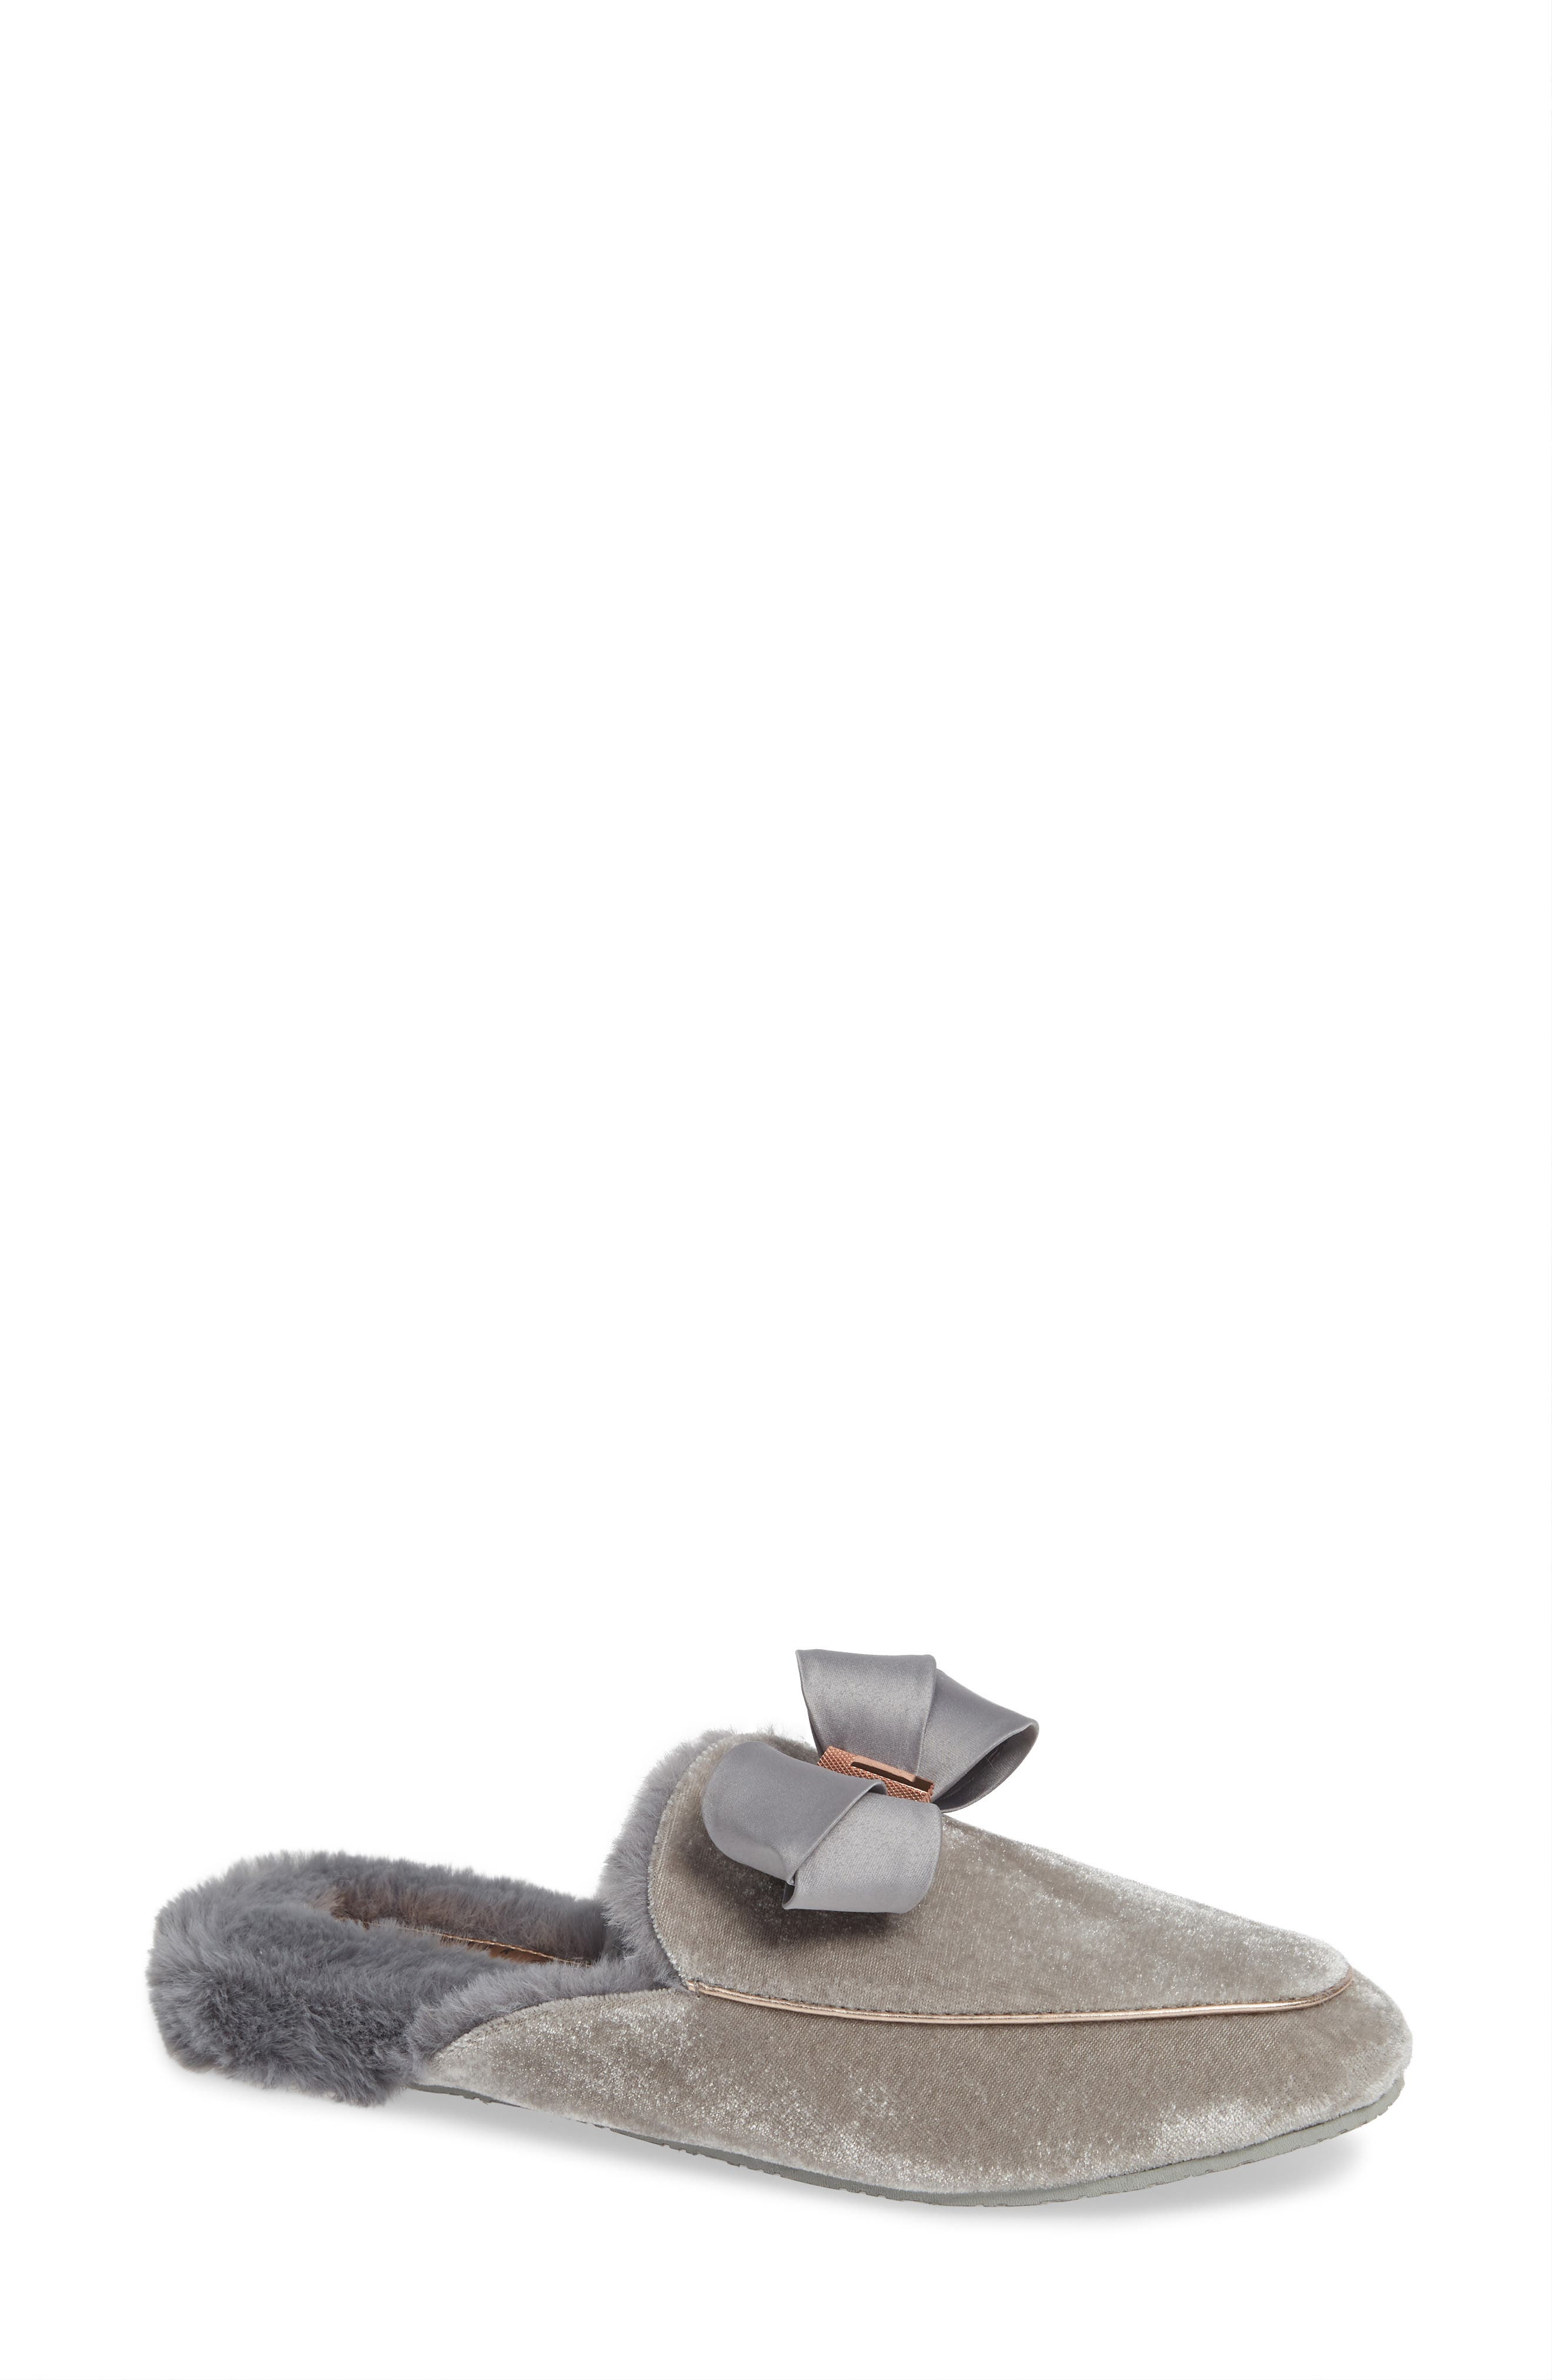 TED BAKER LONDON Faux Fur Slipper, Main, color, 053